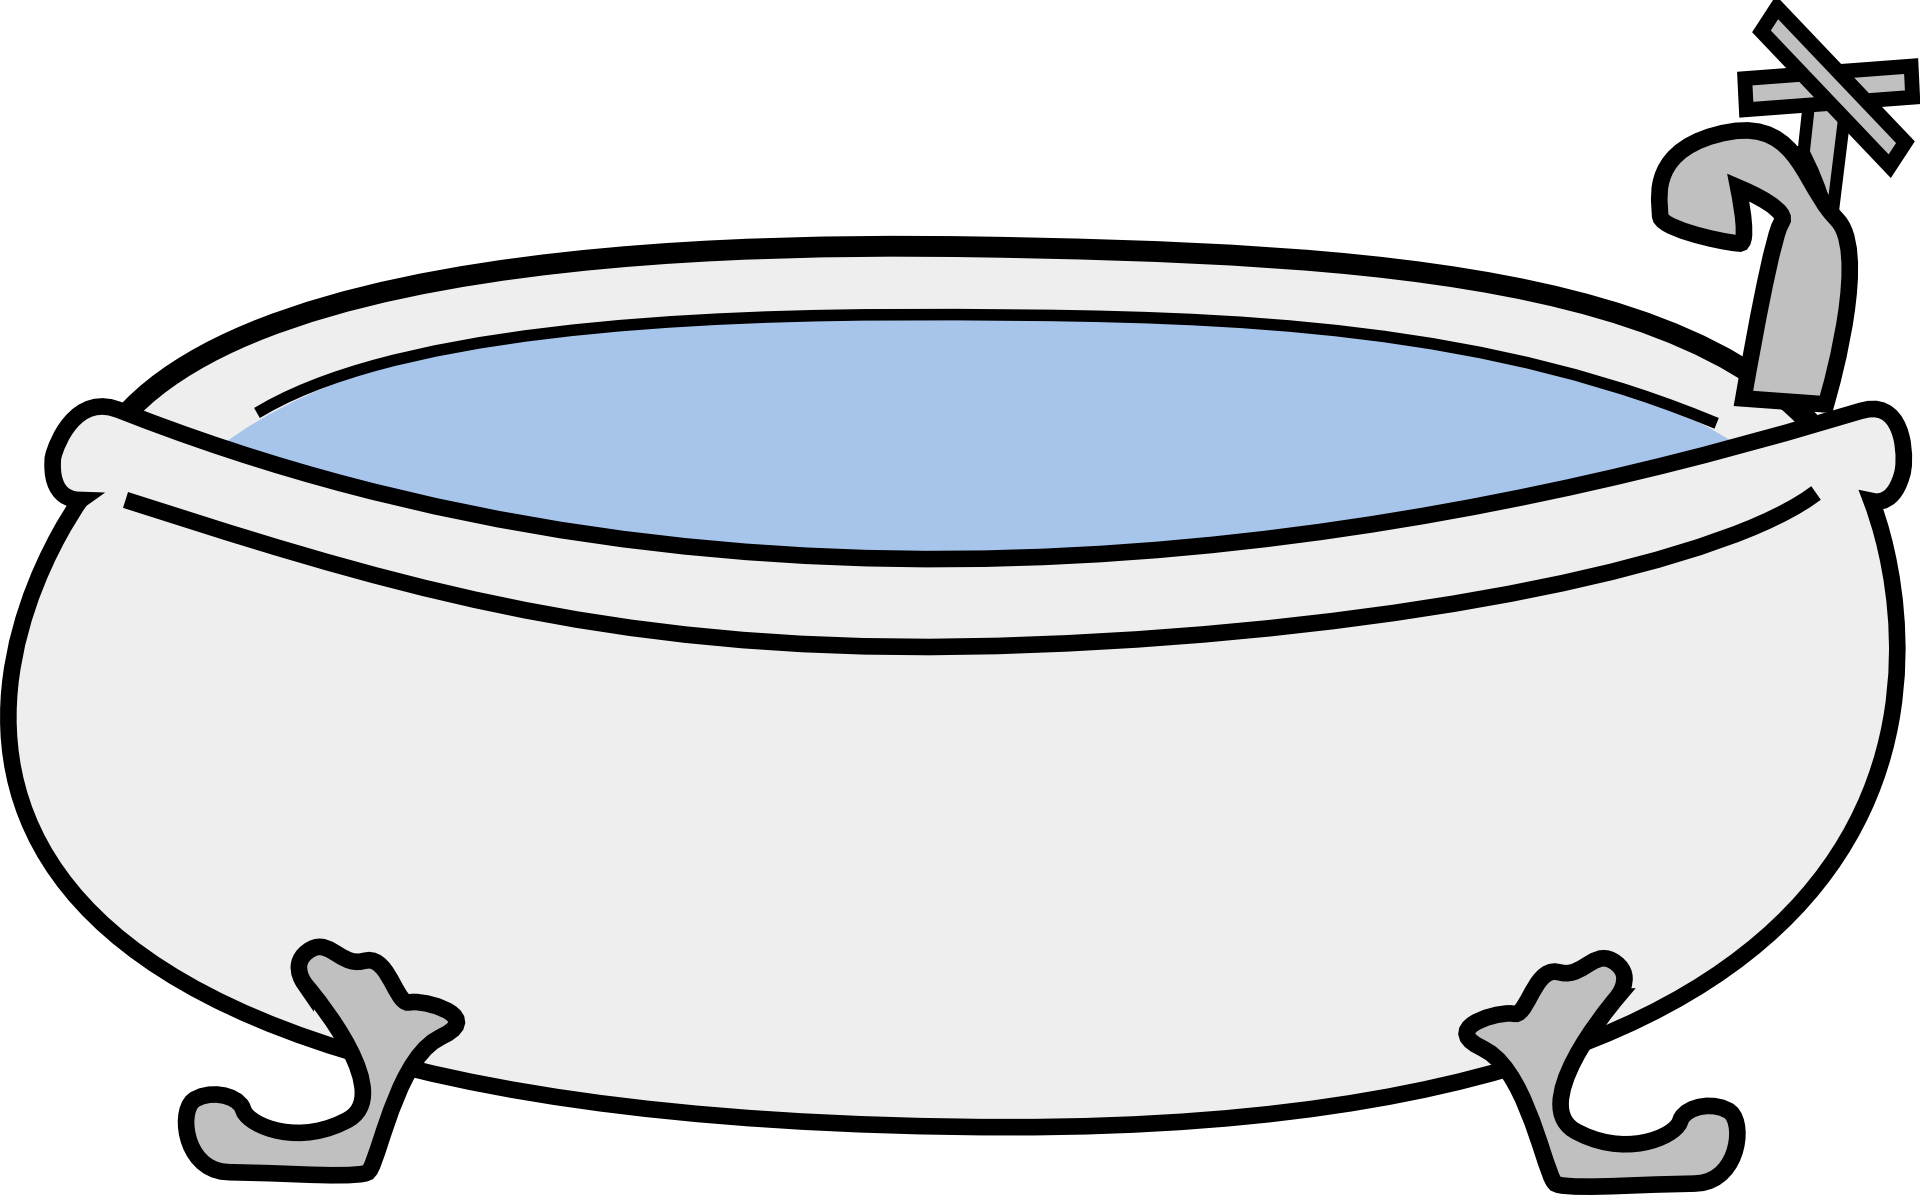 Dreaming clipart transparent. Bathtub hot tub clip